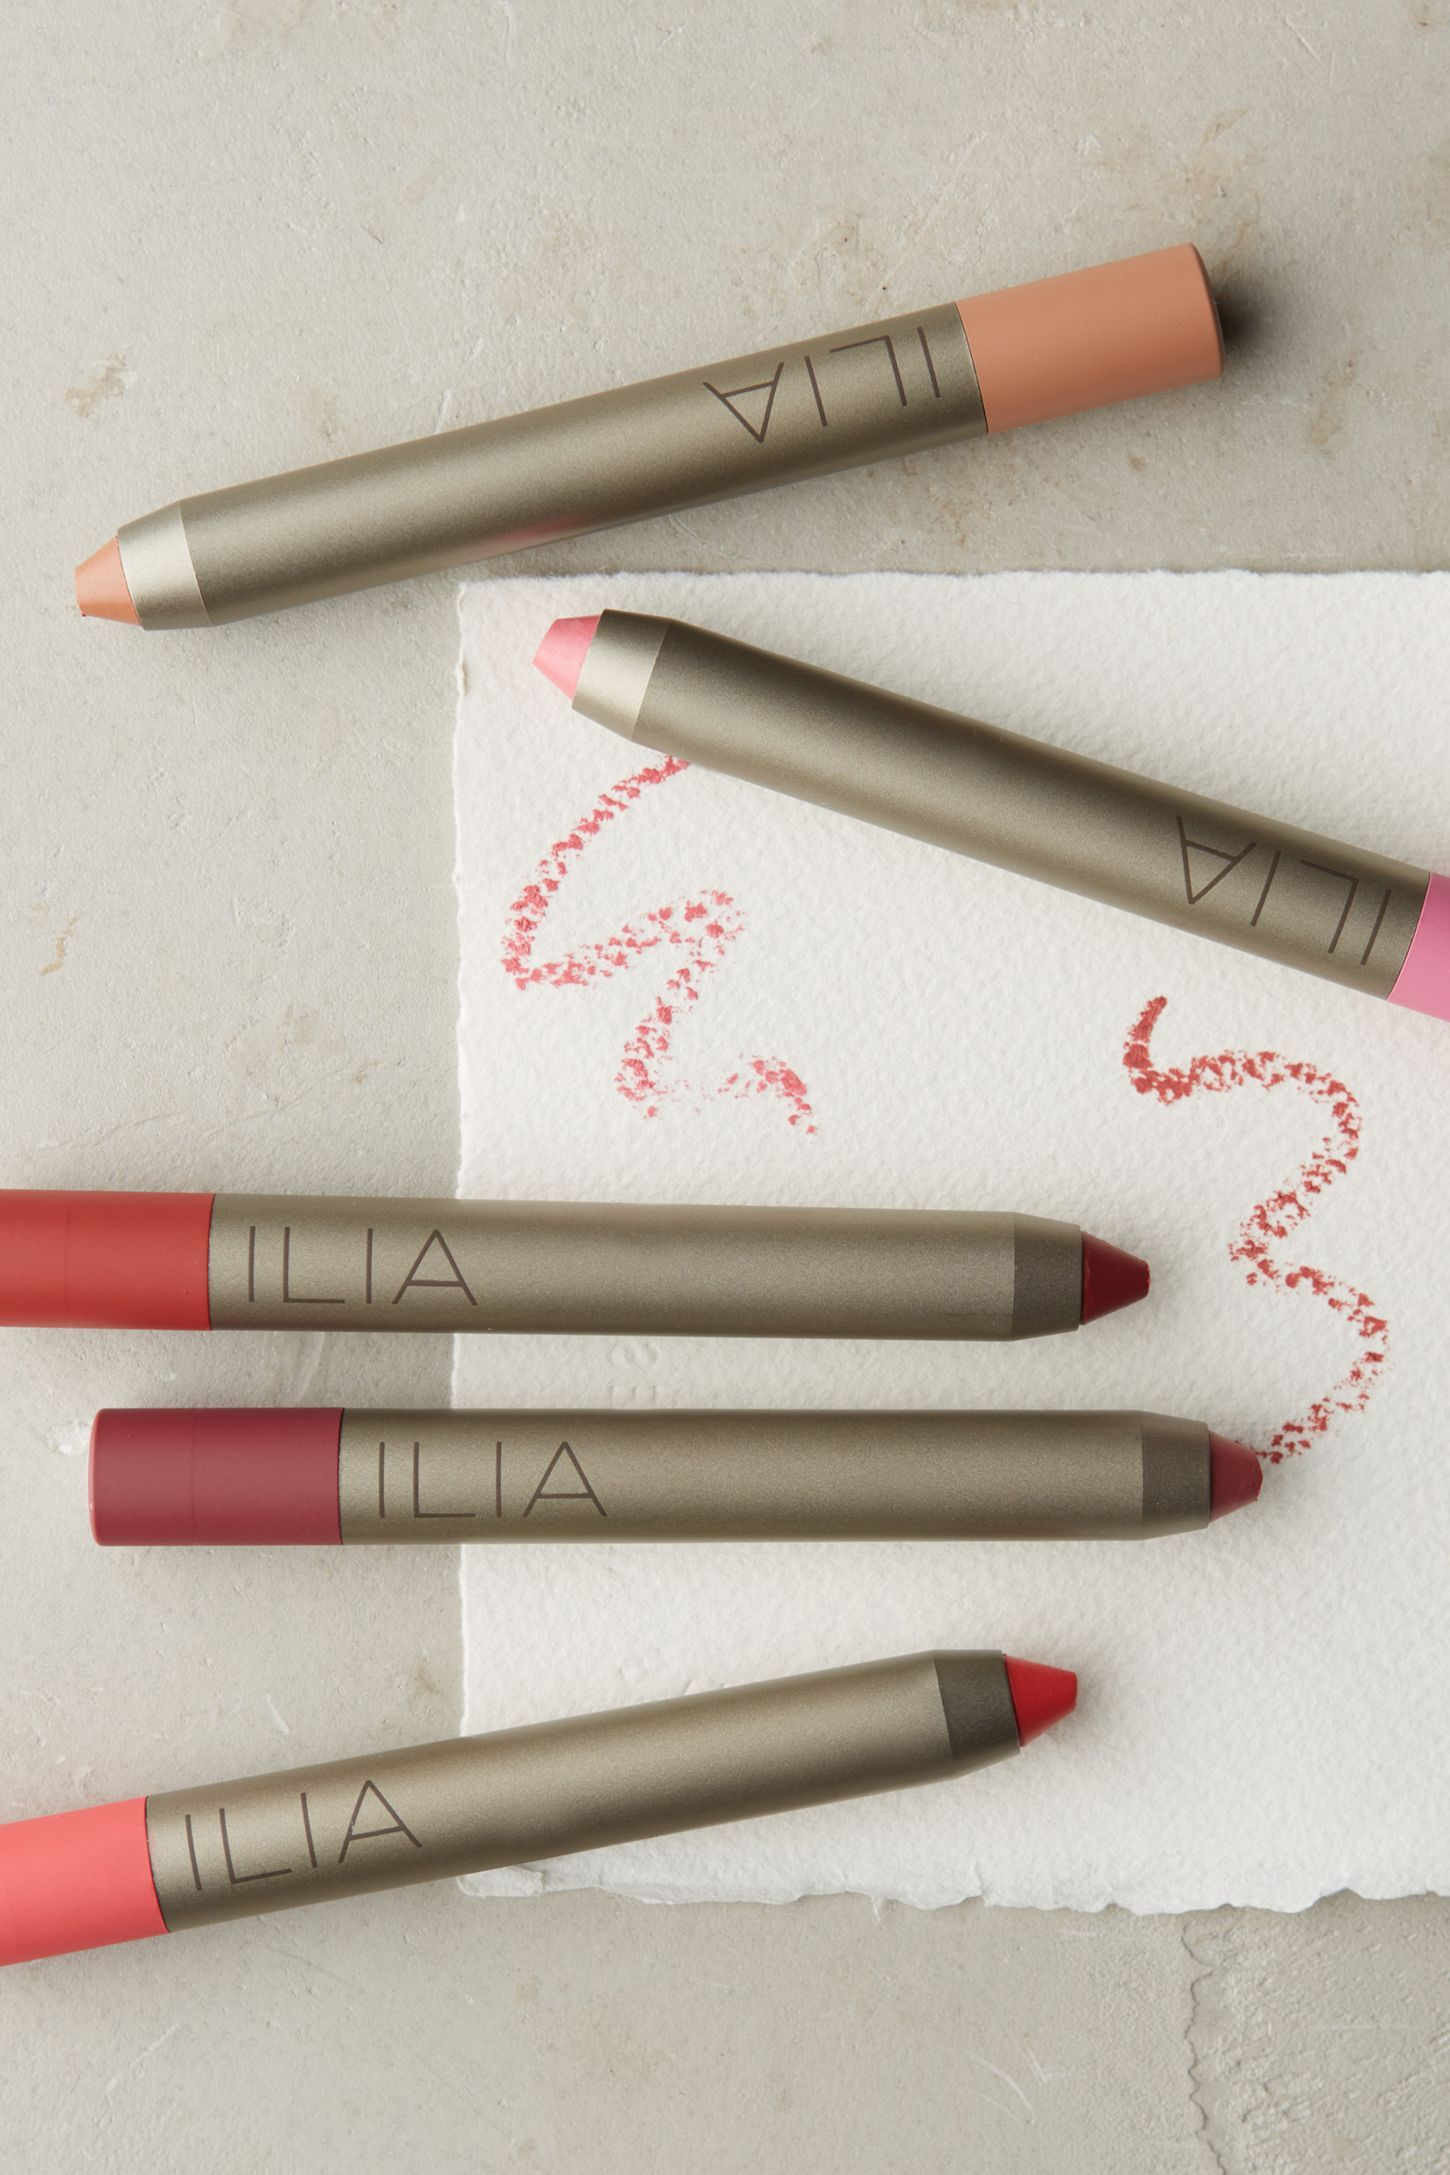 Ilia Lipstick Crayon Ilia lipstick, Crayon lipstick